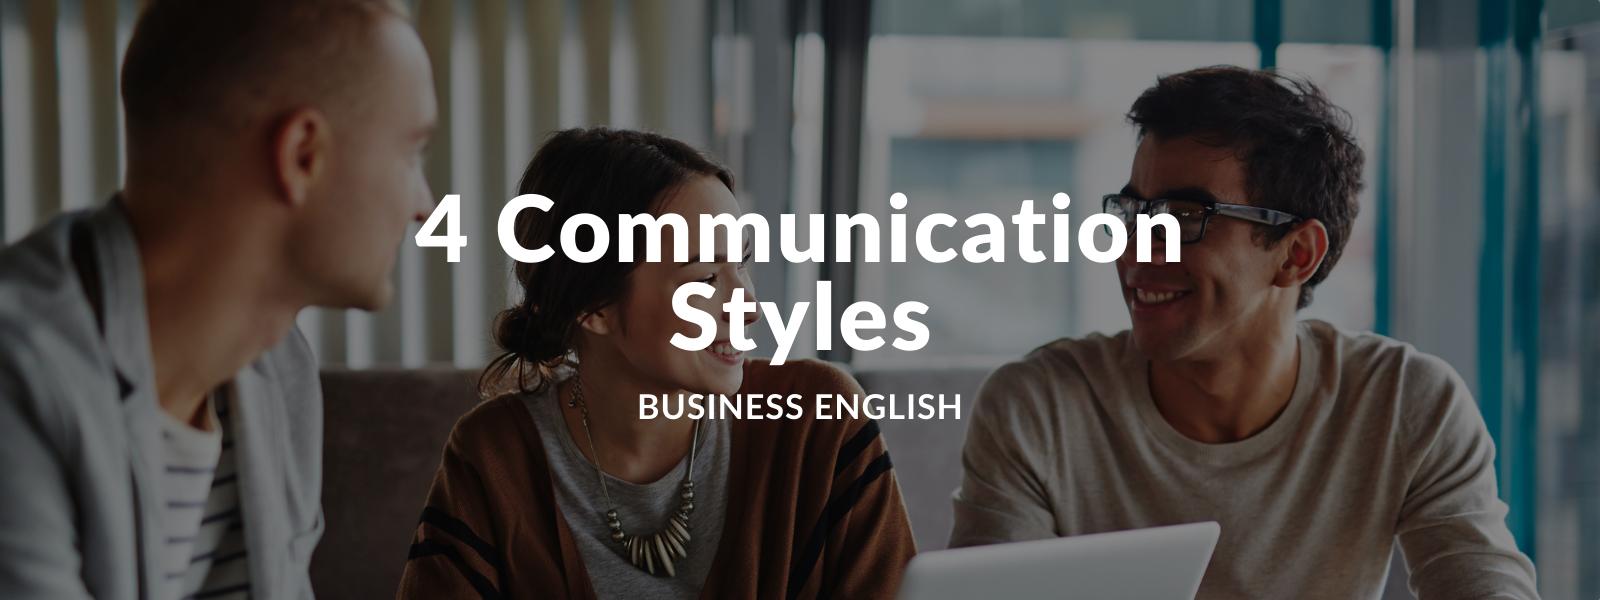 Communication Styles - Talaera Business English Training